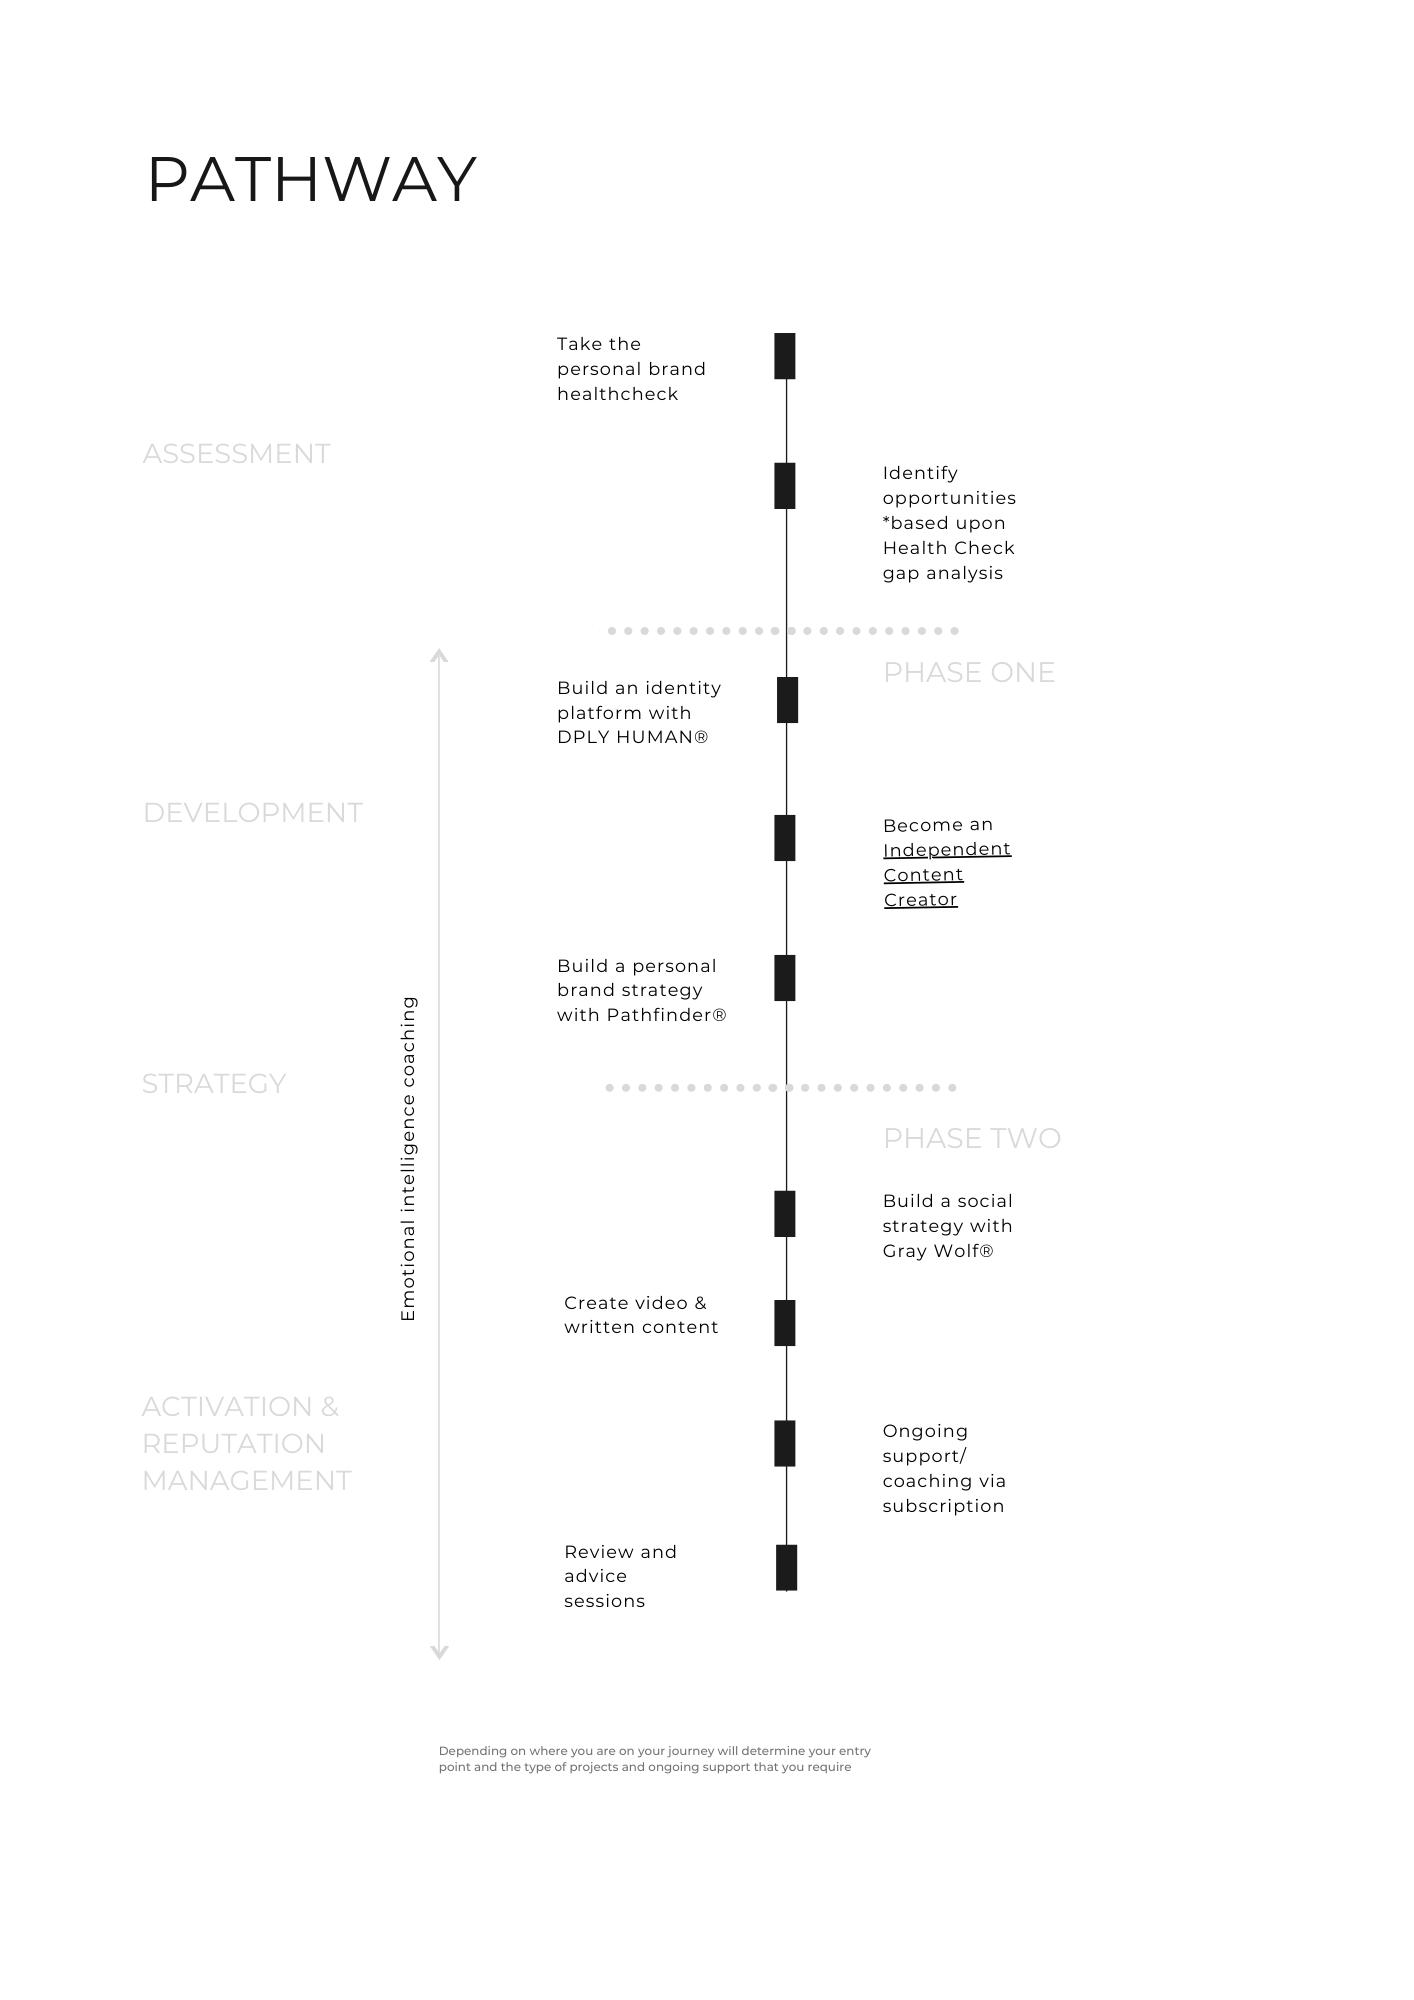 jago-pathway-2021-07-mobile